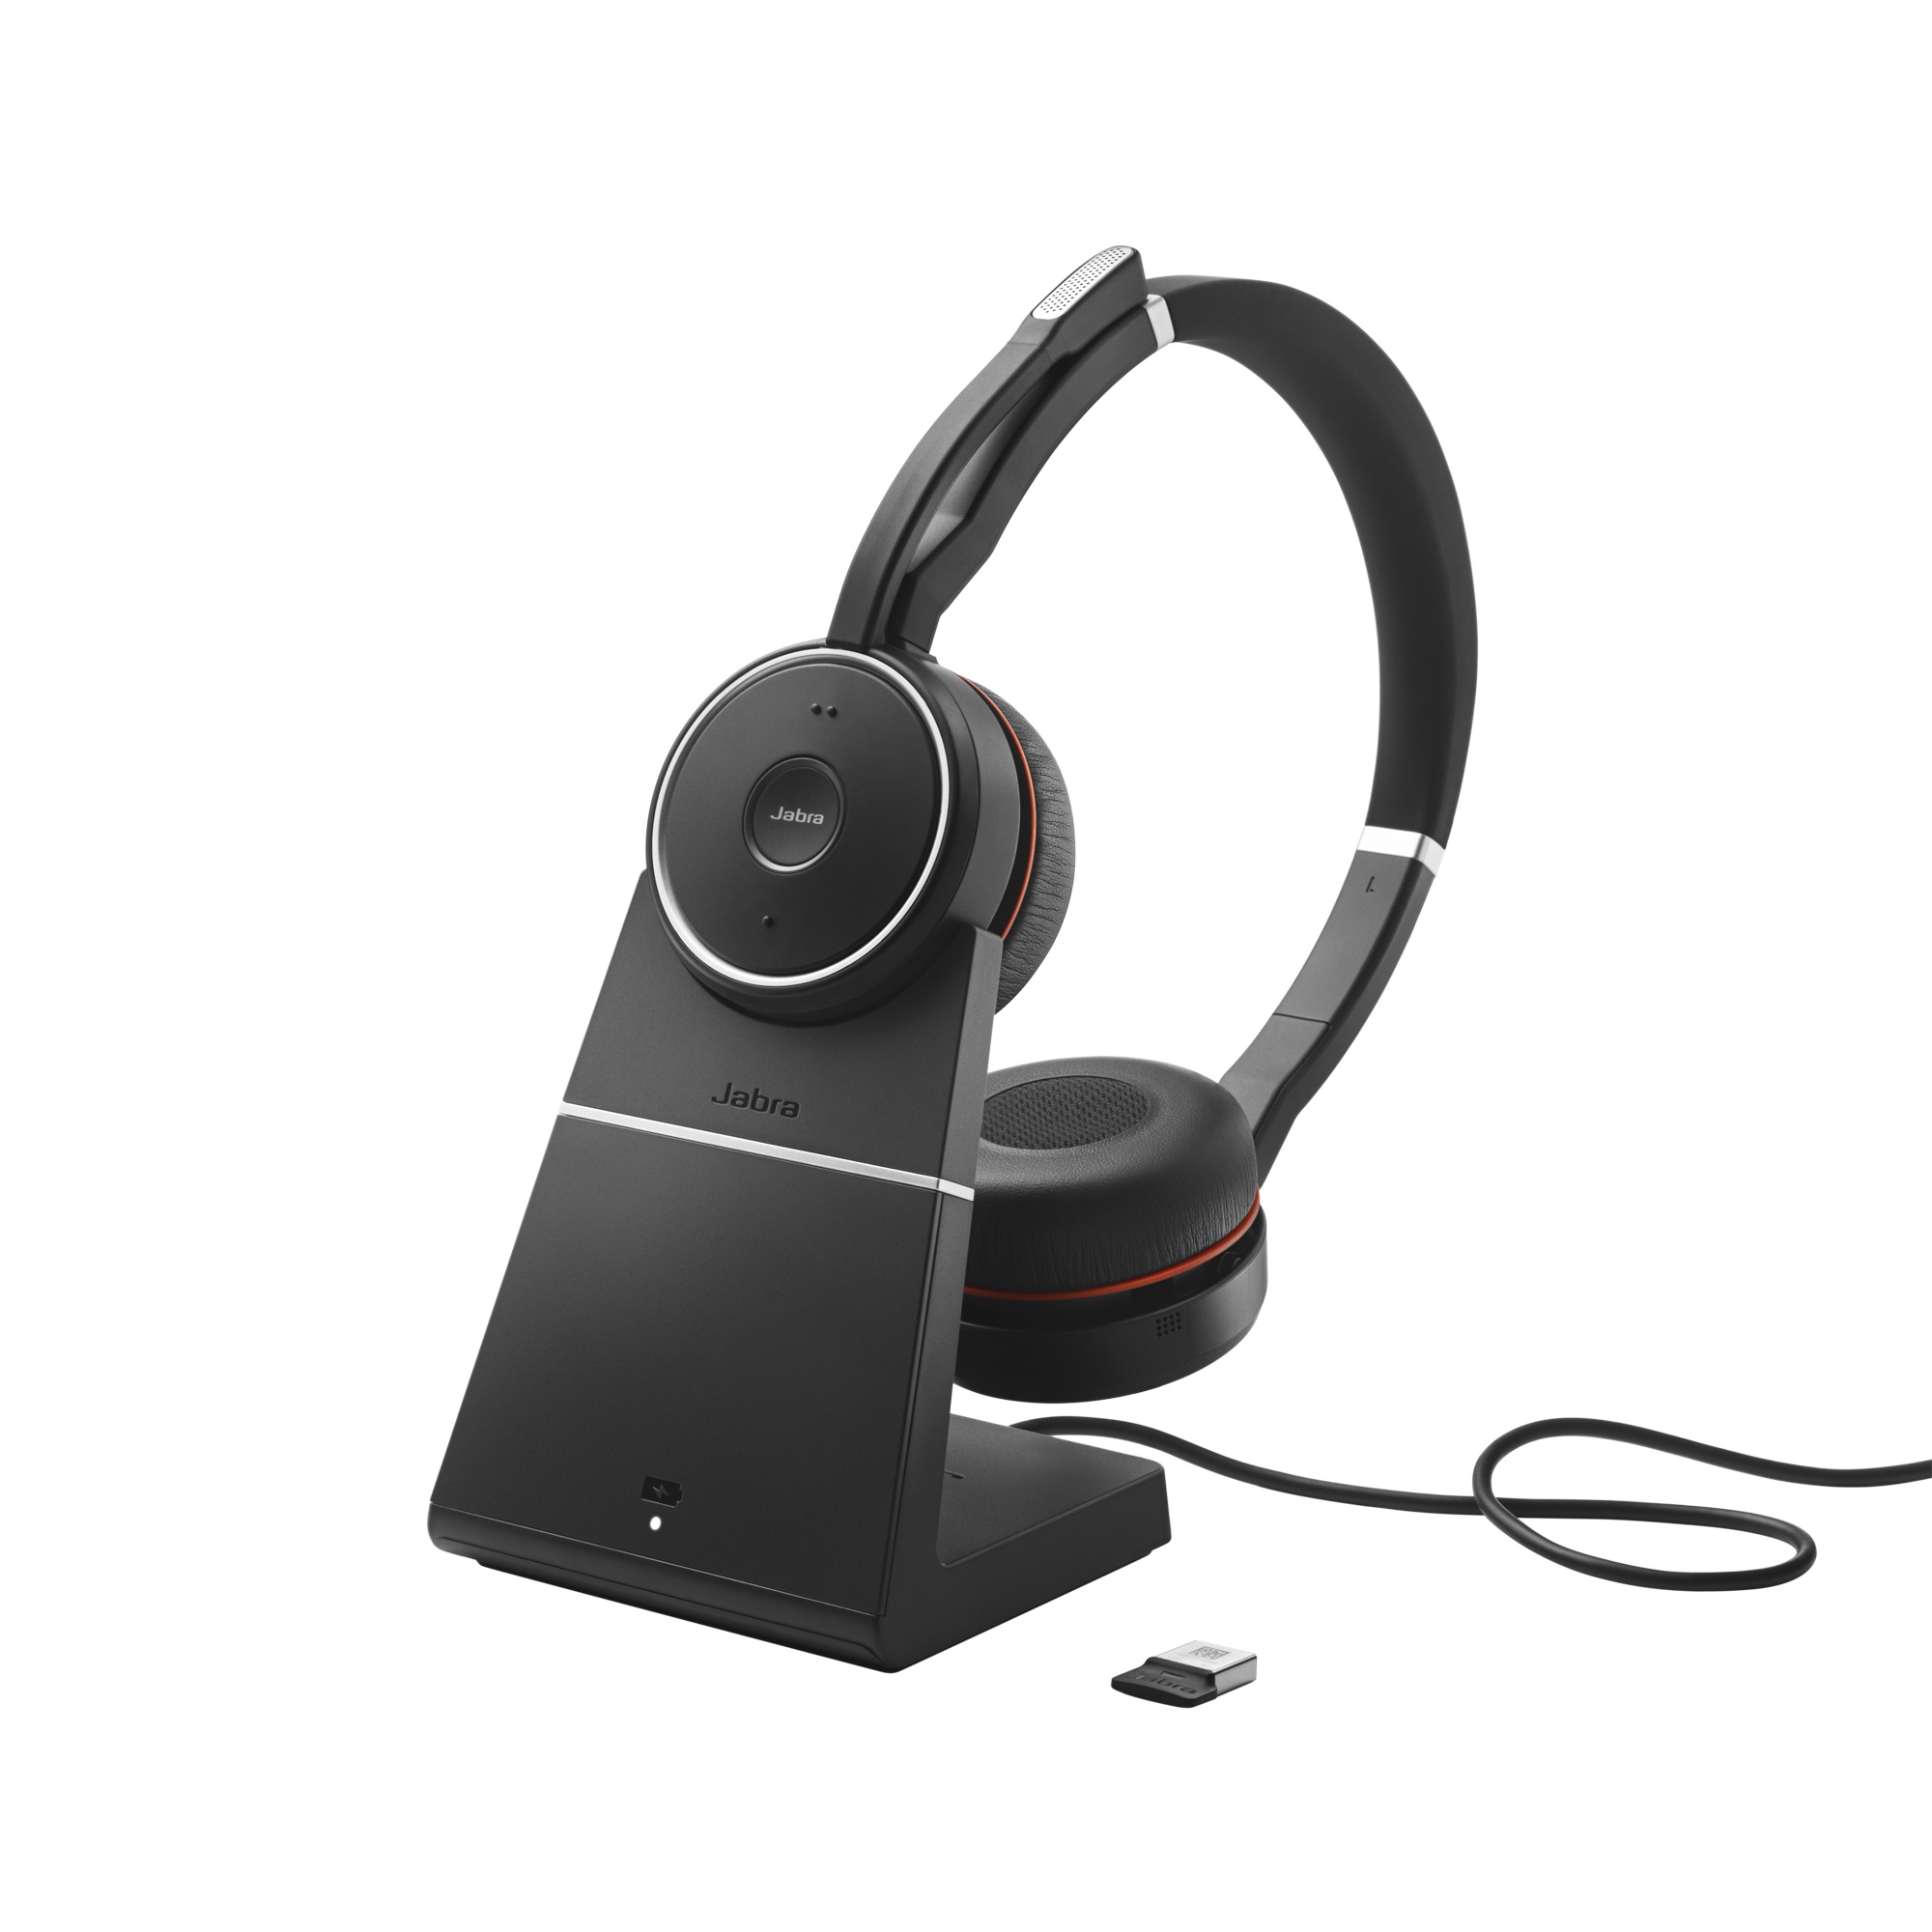 Jabra Evolve 75, Duo, USB-BT, stojánek